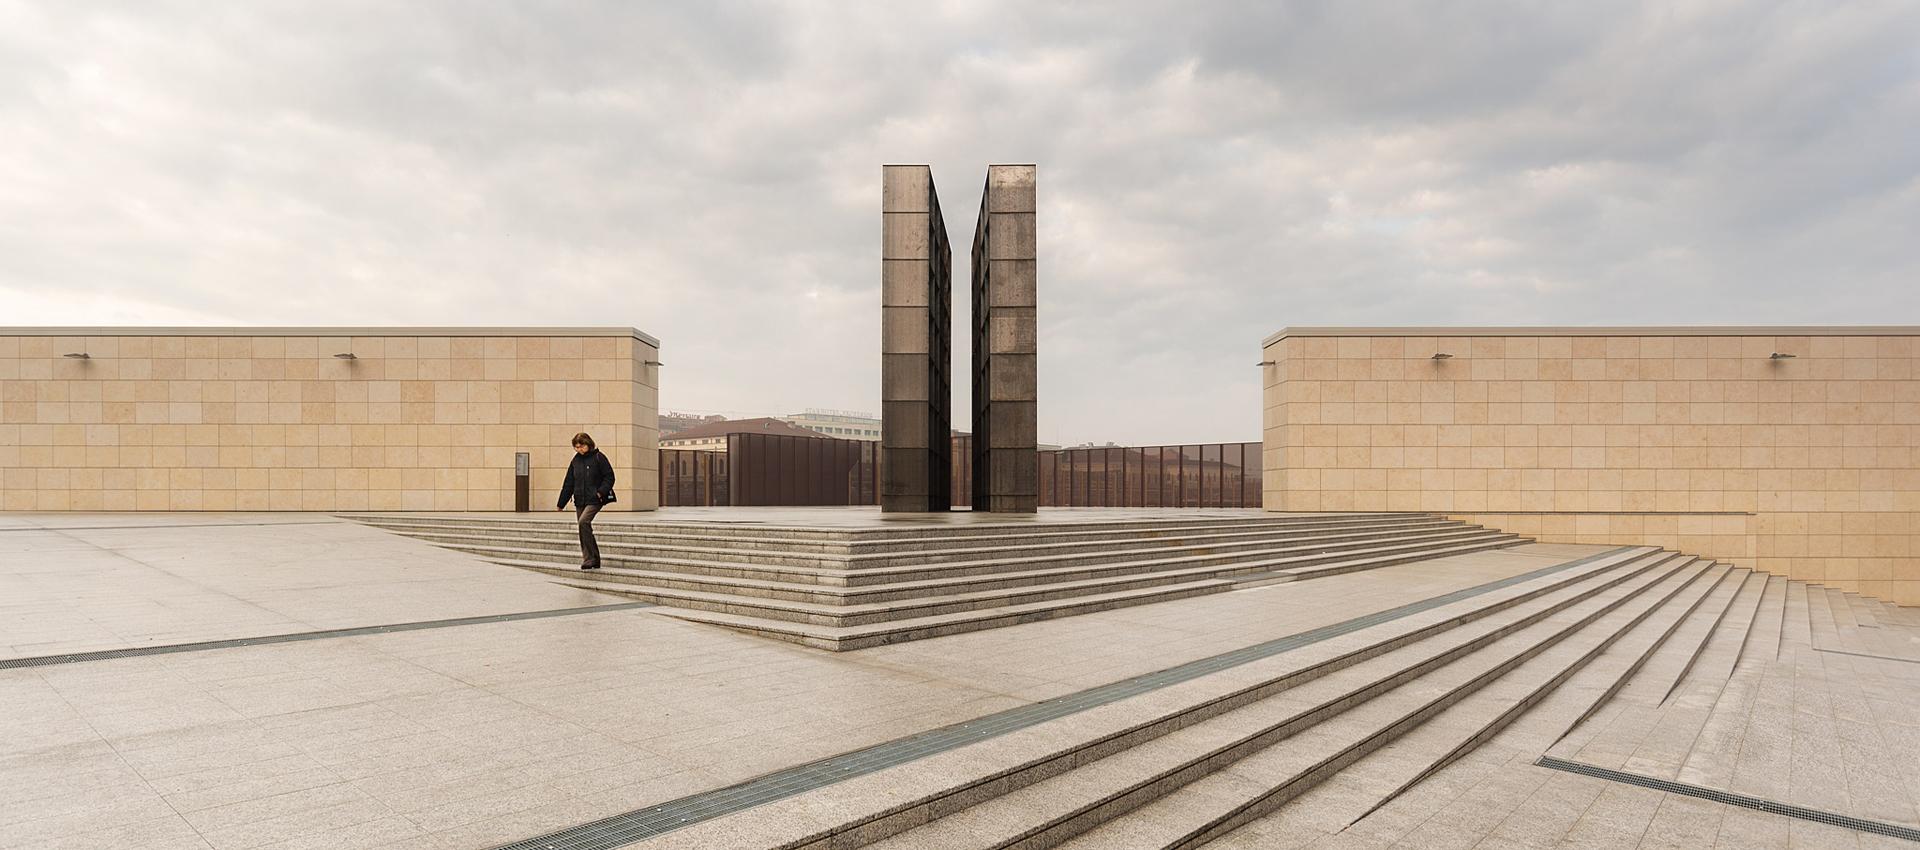 Memorial Shoah Bolonia por SET. Fotografía © Simone Bossi